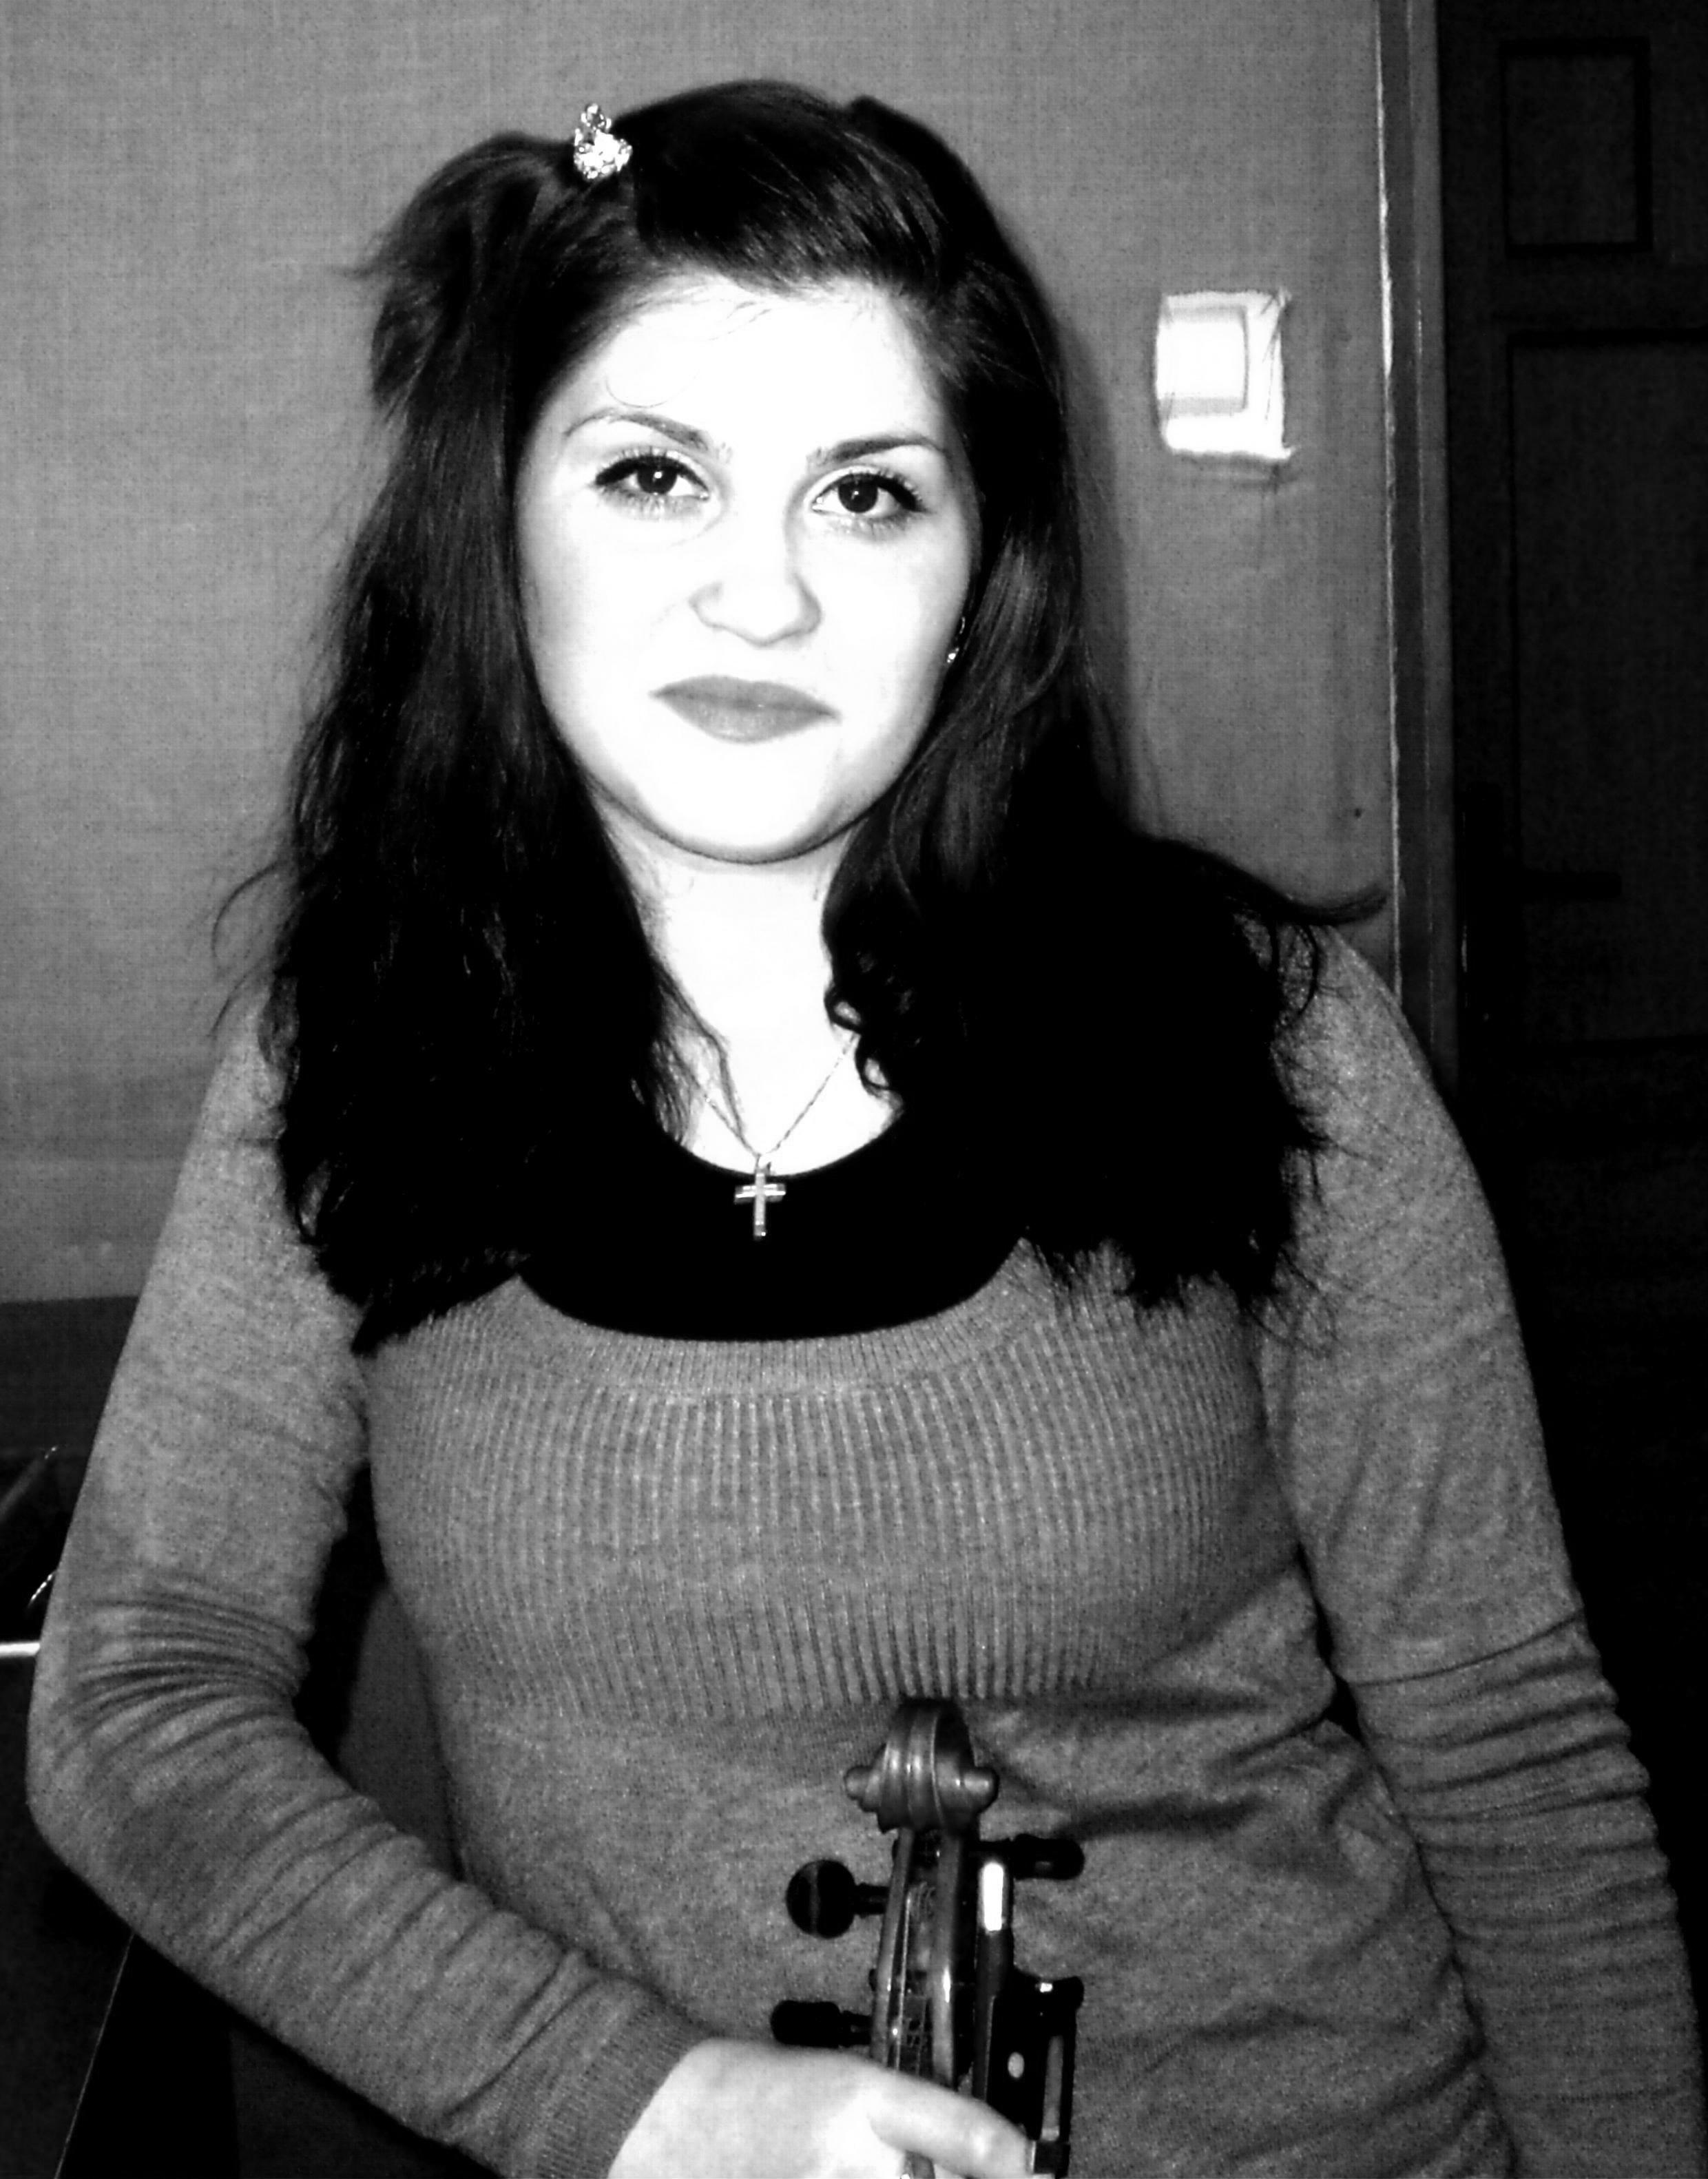 georgiana young - photo #2